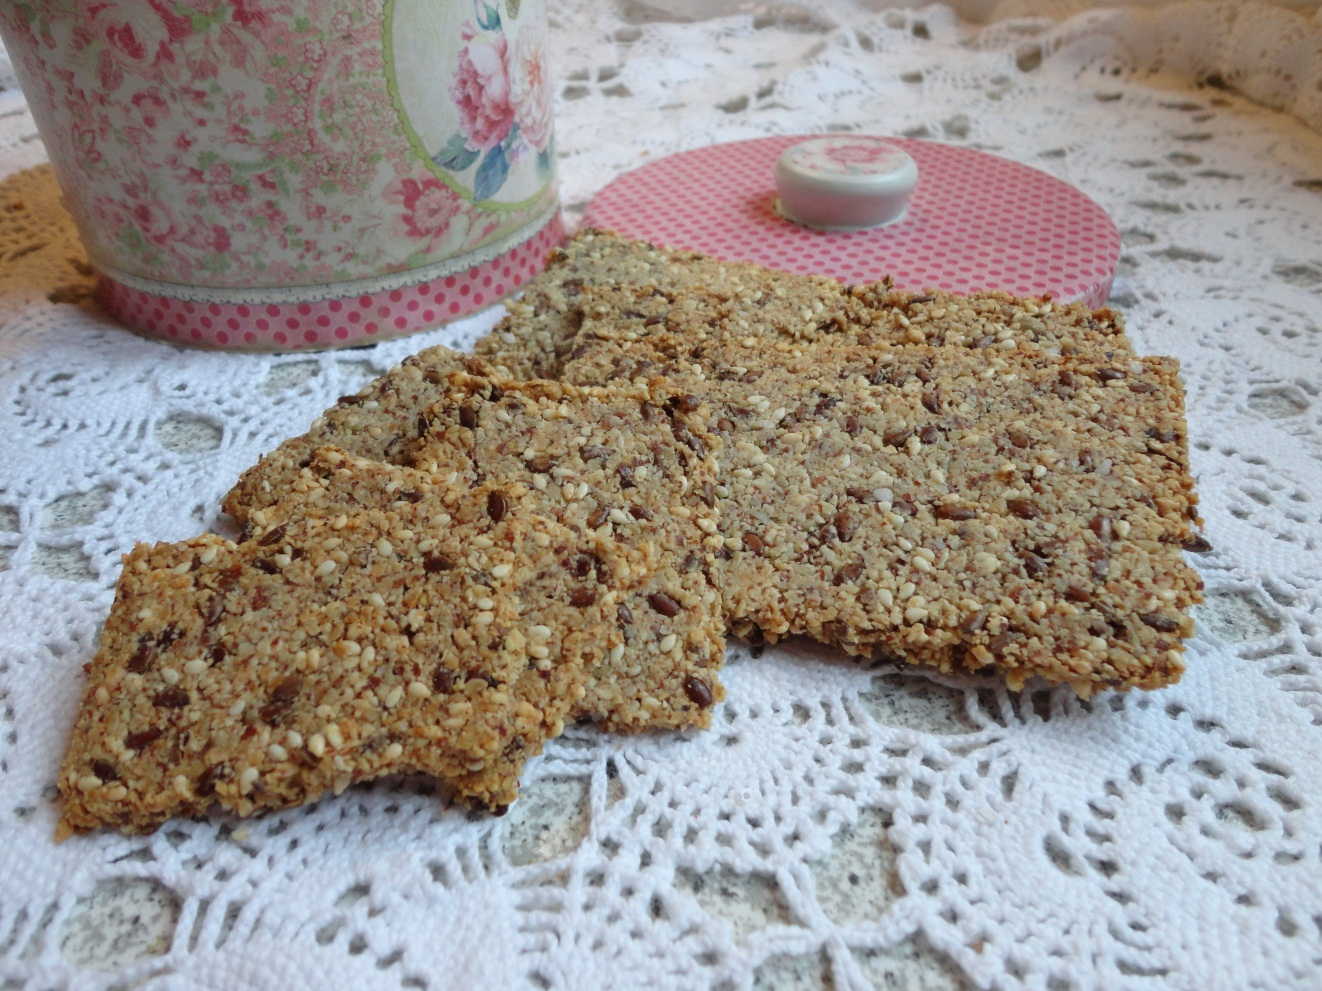 Grove knækbrød – Duftende brød